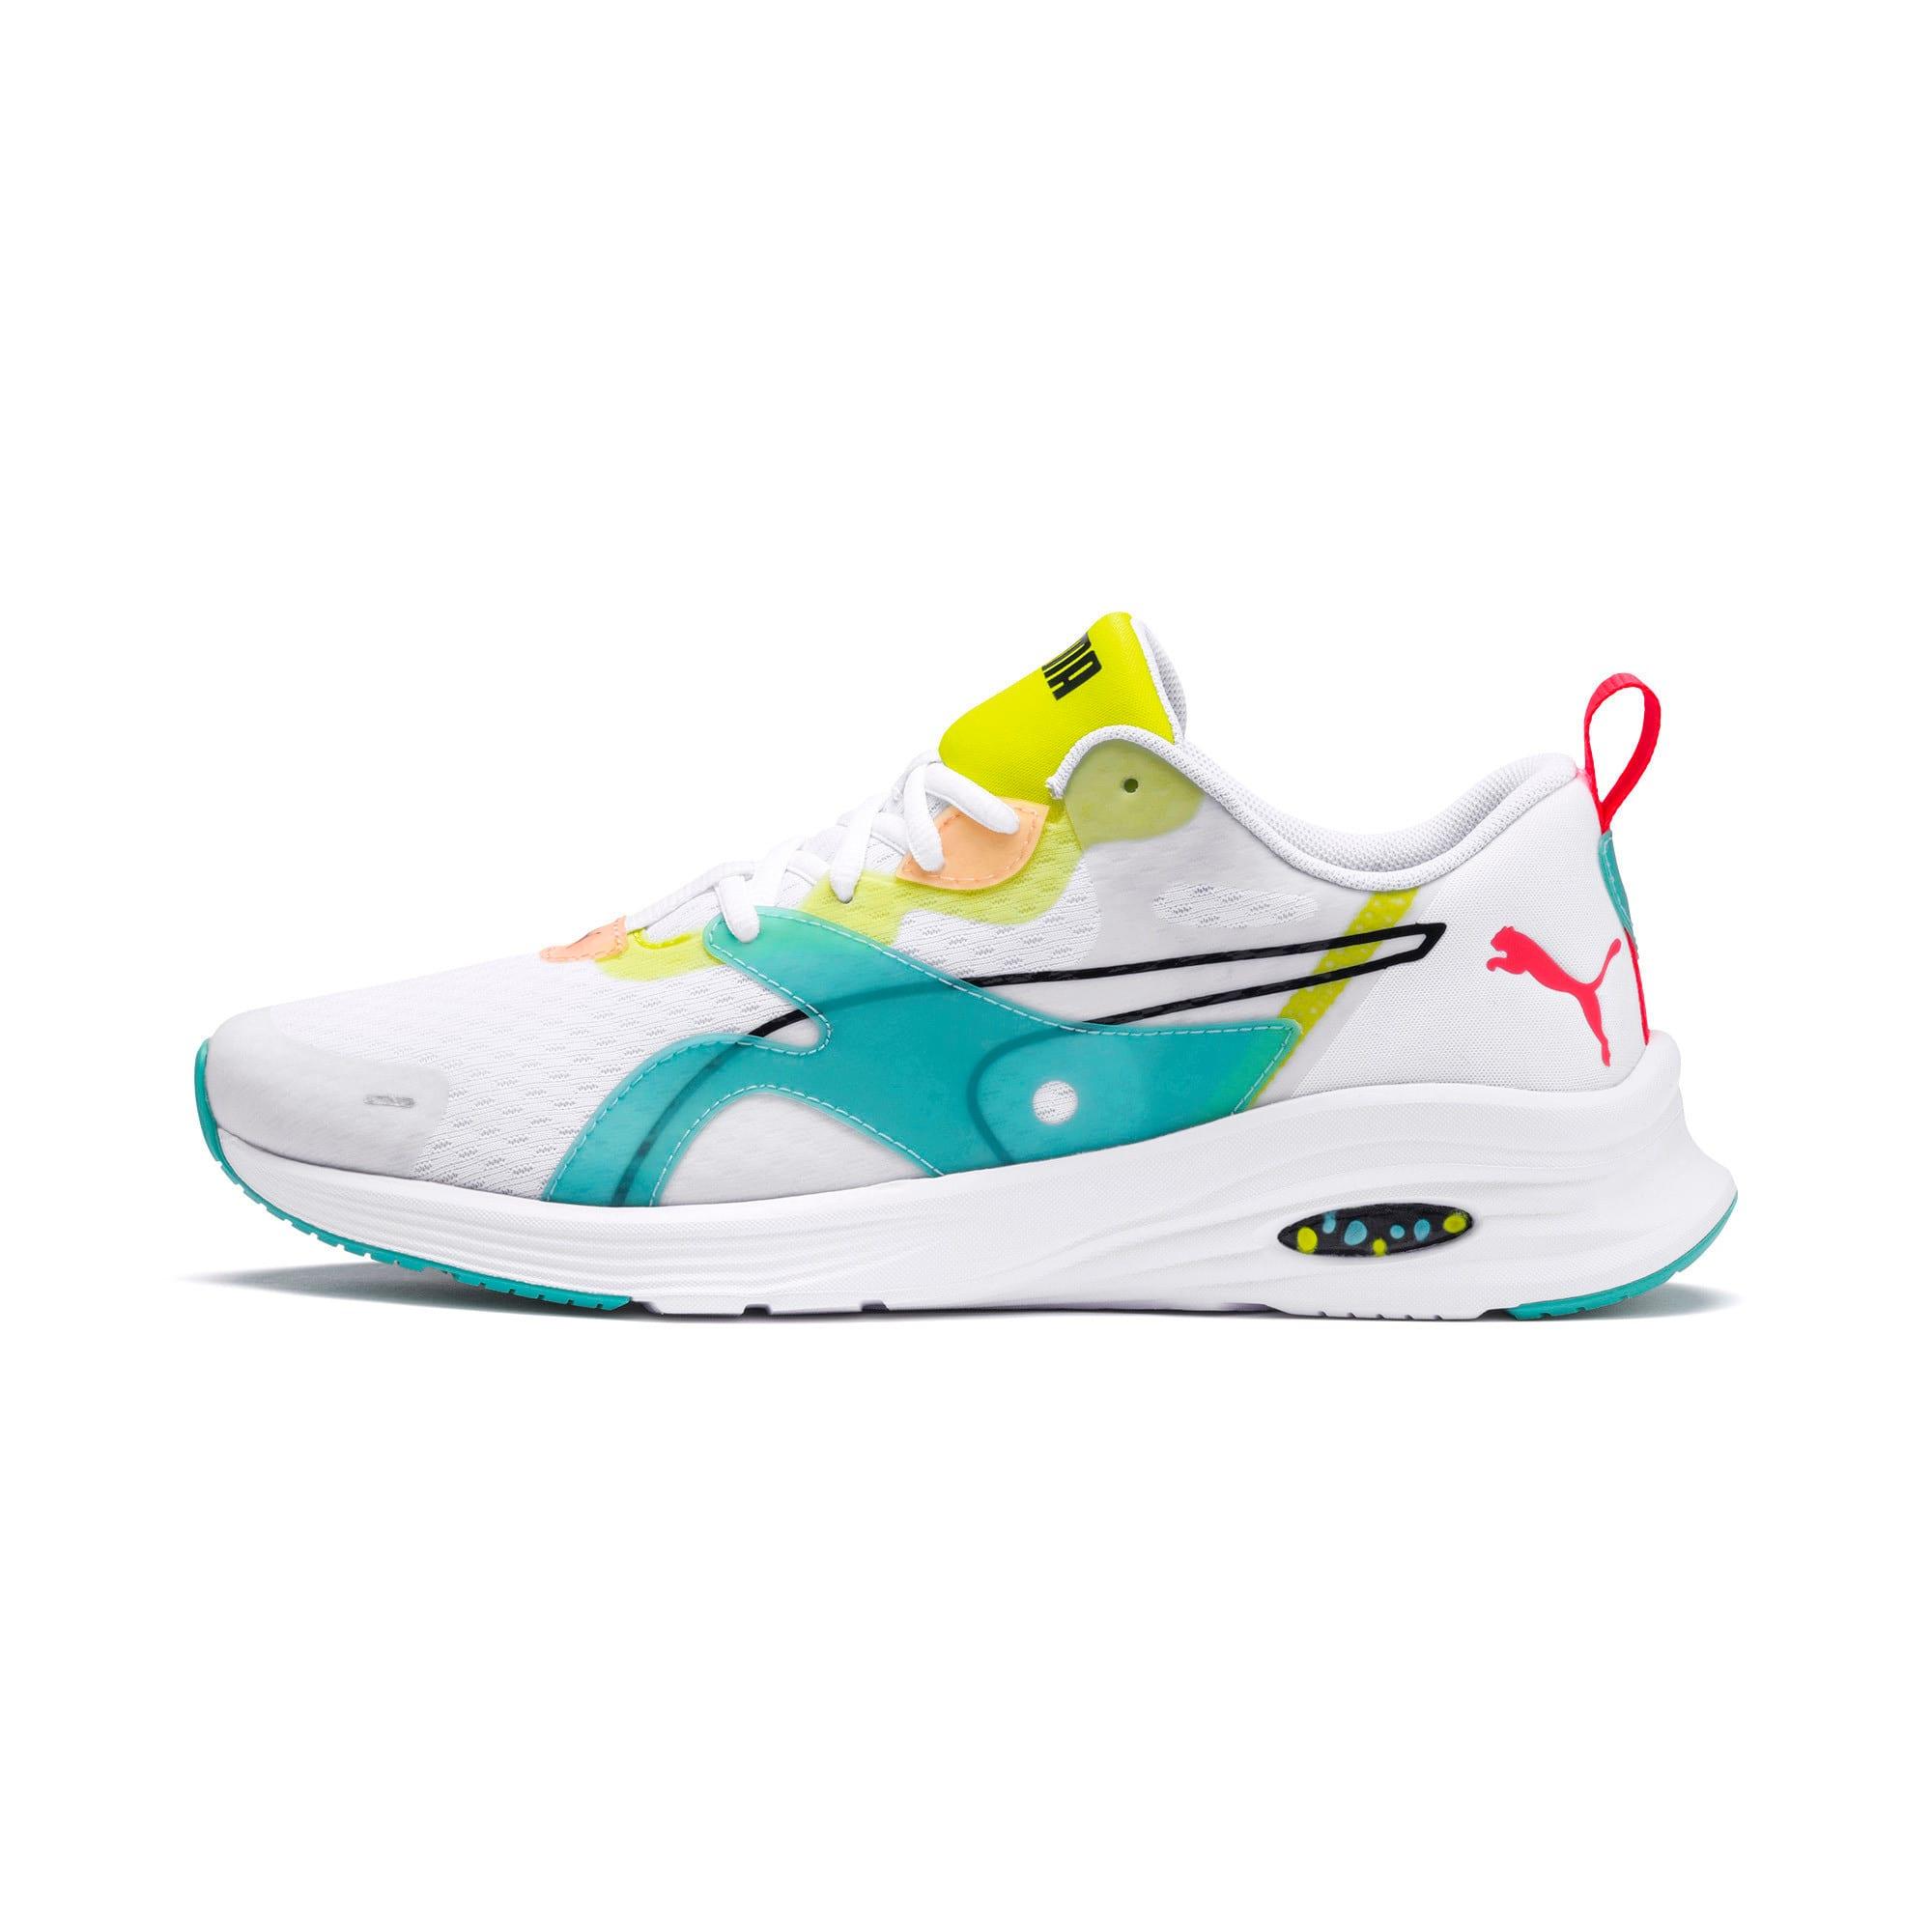 Thumbnail 1 of HYBRID Fuego Men's Running Shoes, White-Nrgy Rose-Yellow Alert, medium